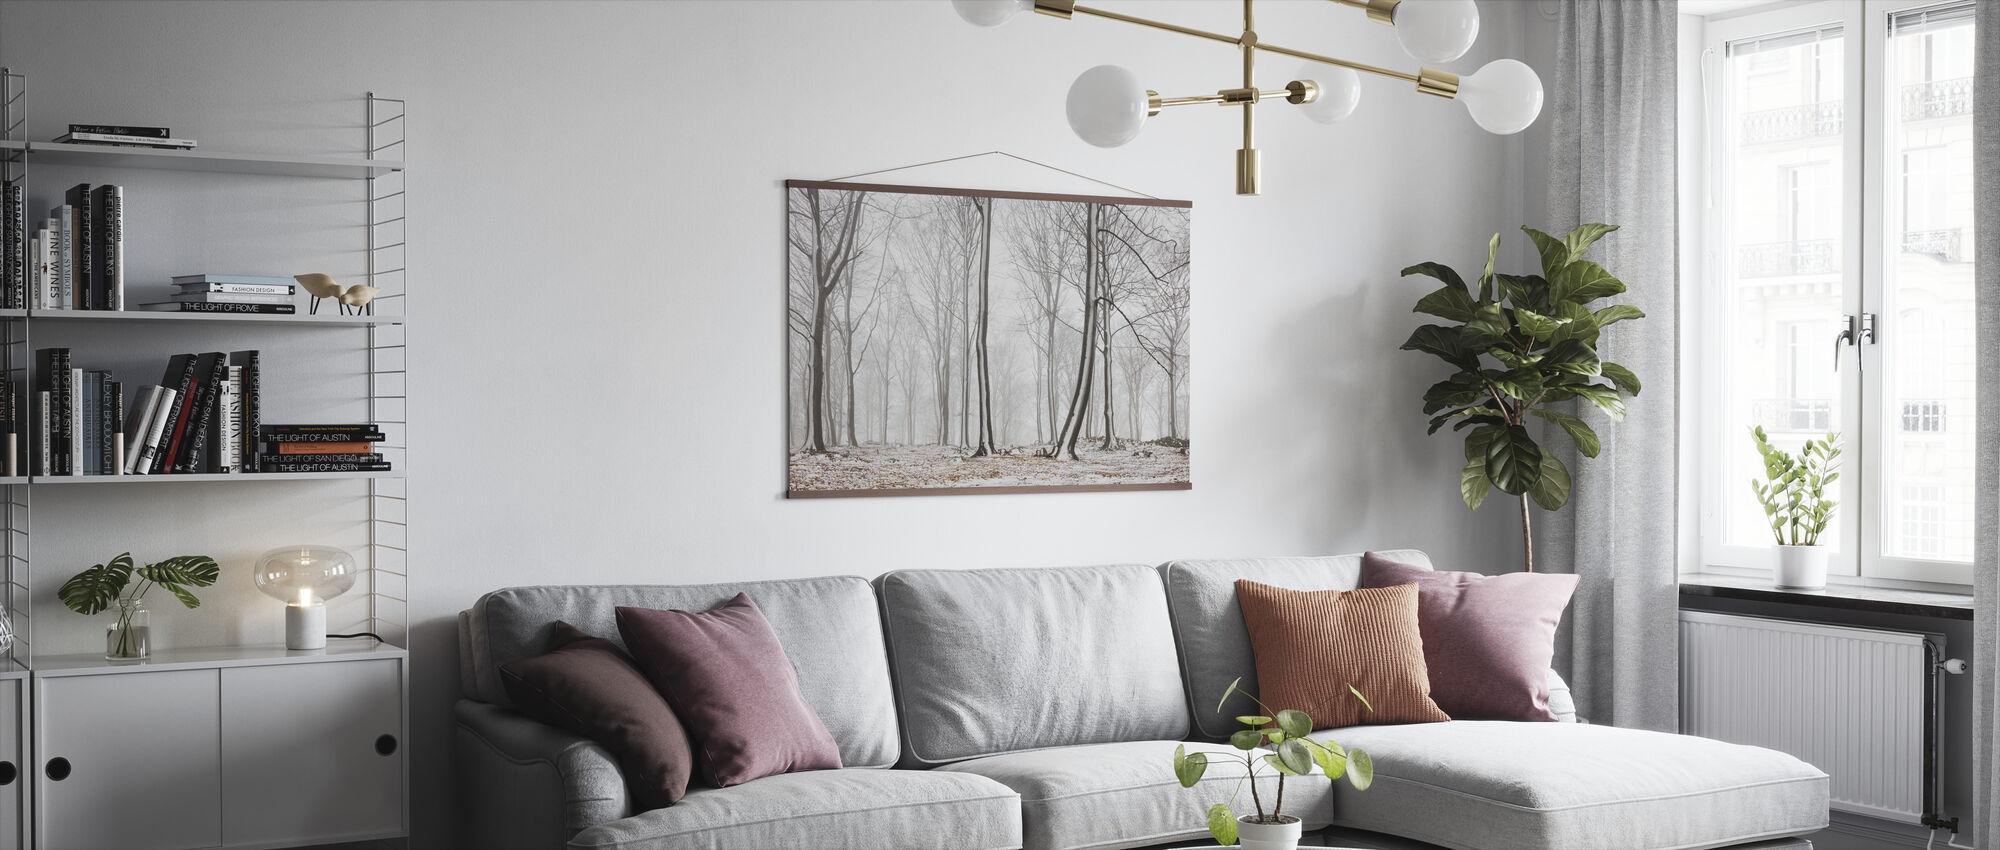 Bare Stems in Winter - Poster - Living Room